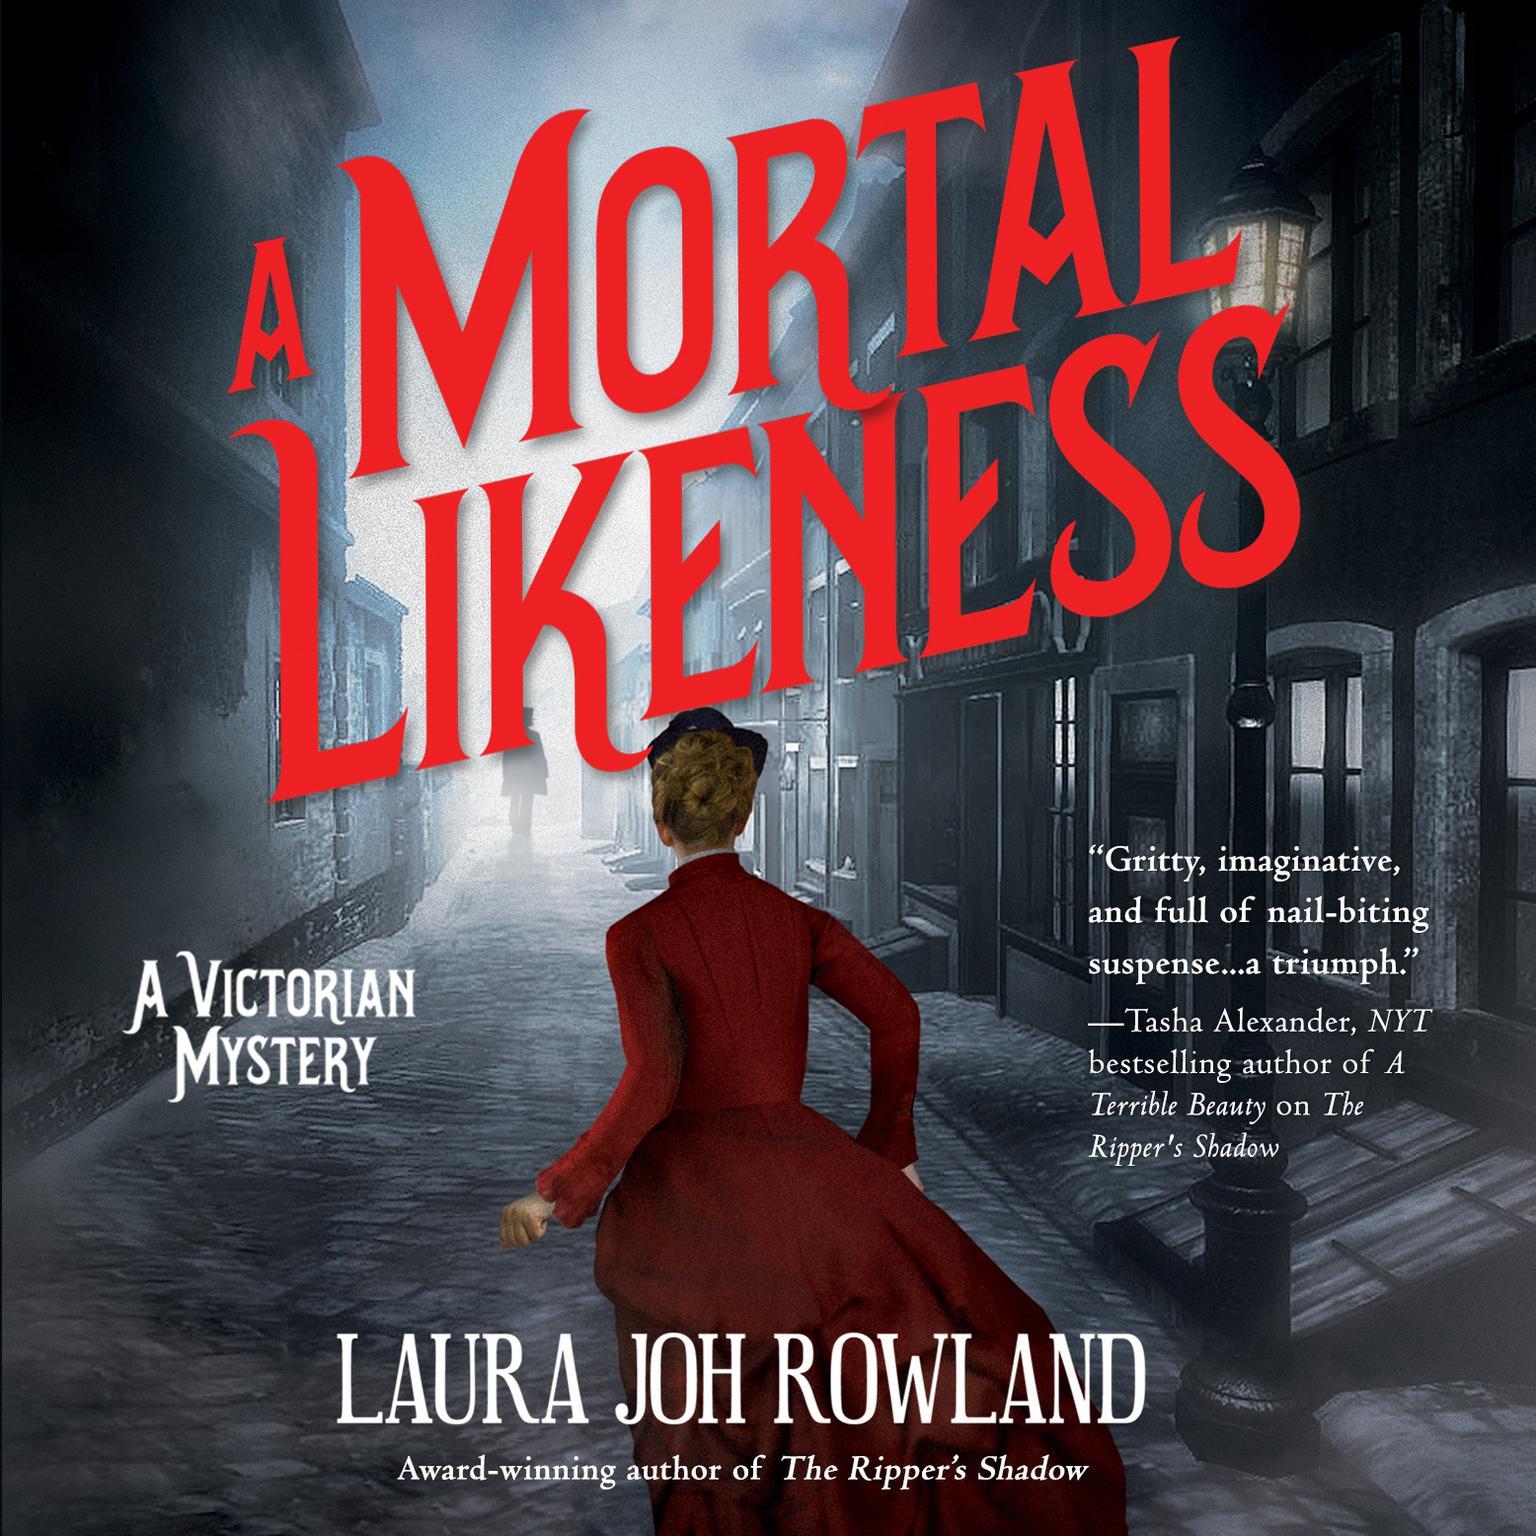 A Mortal Likeness Audiobook, by Laura Joh Rowland